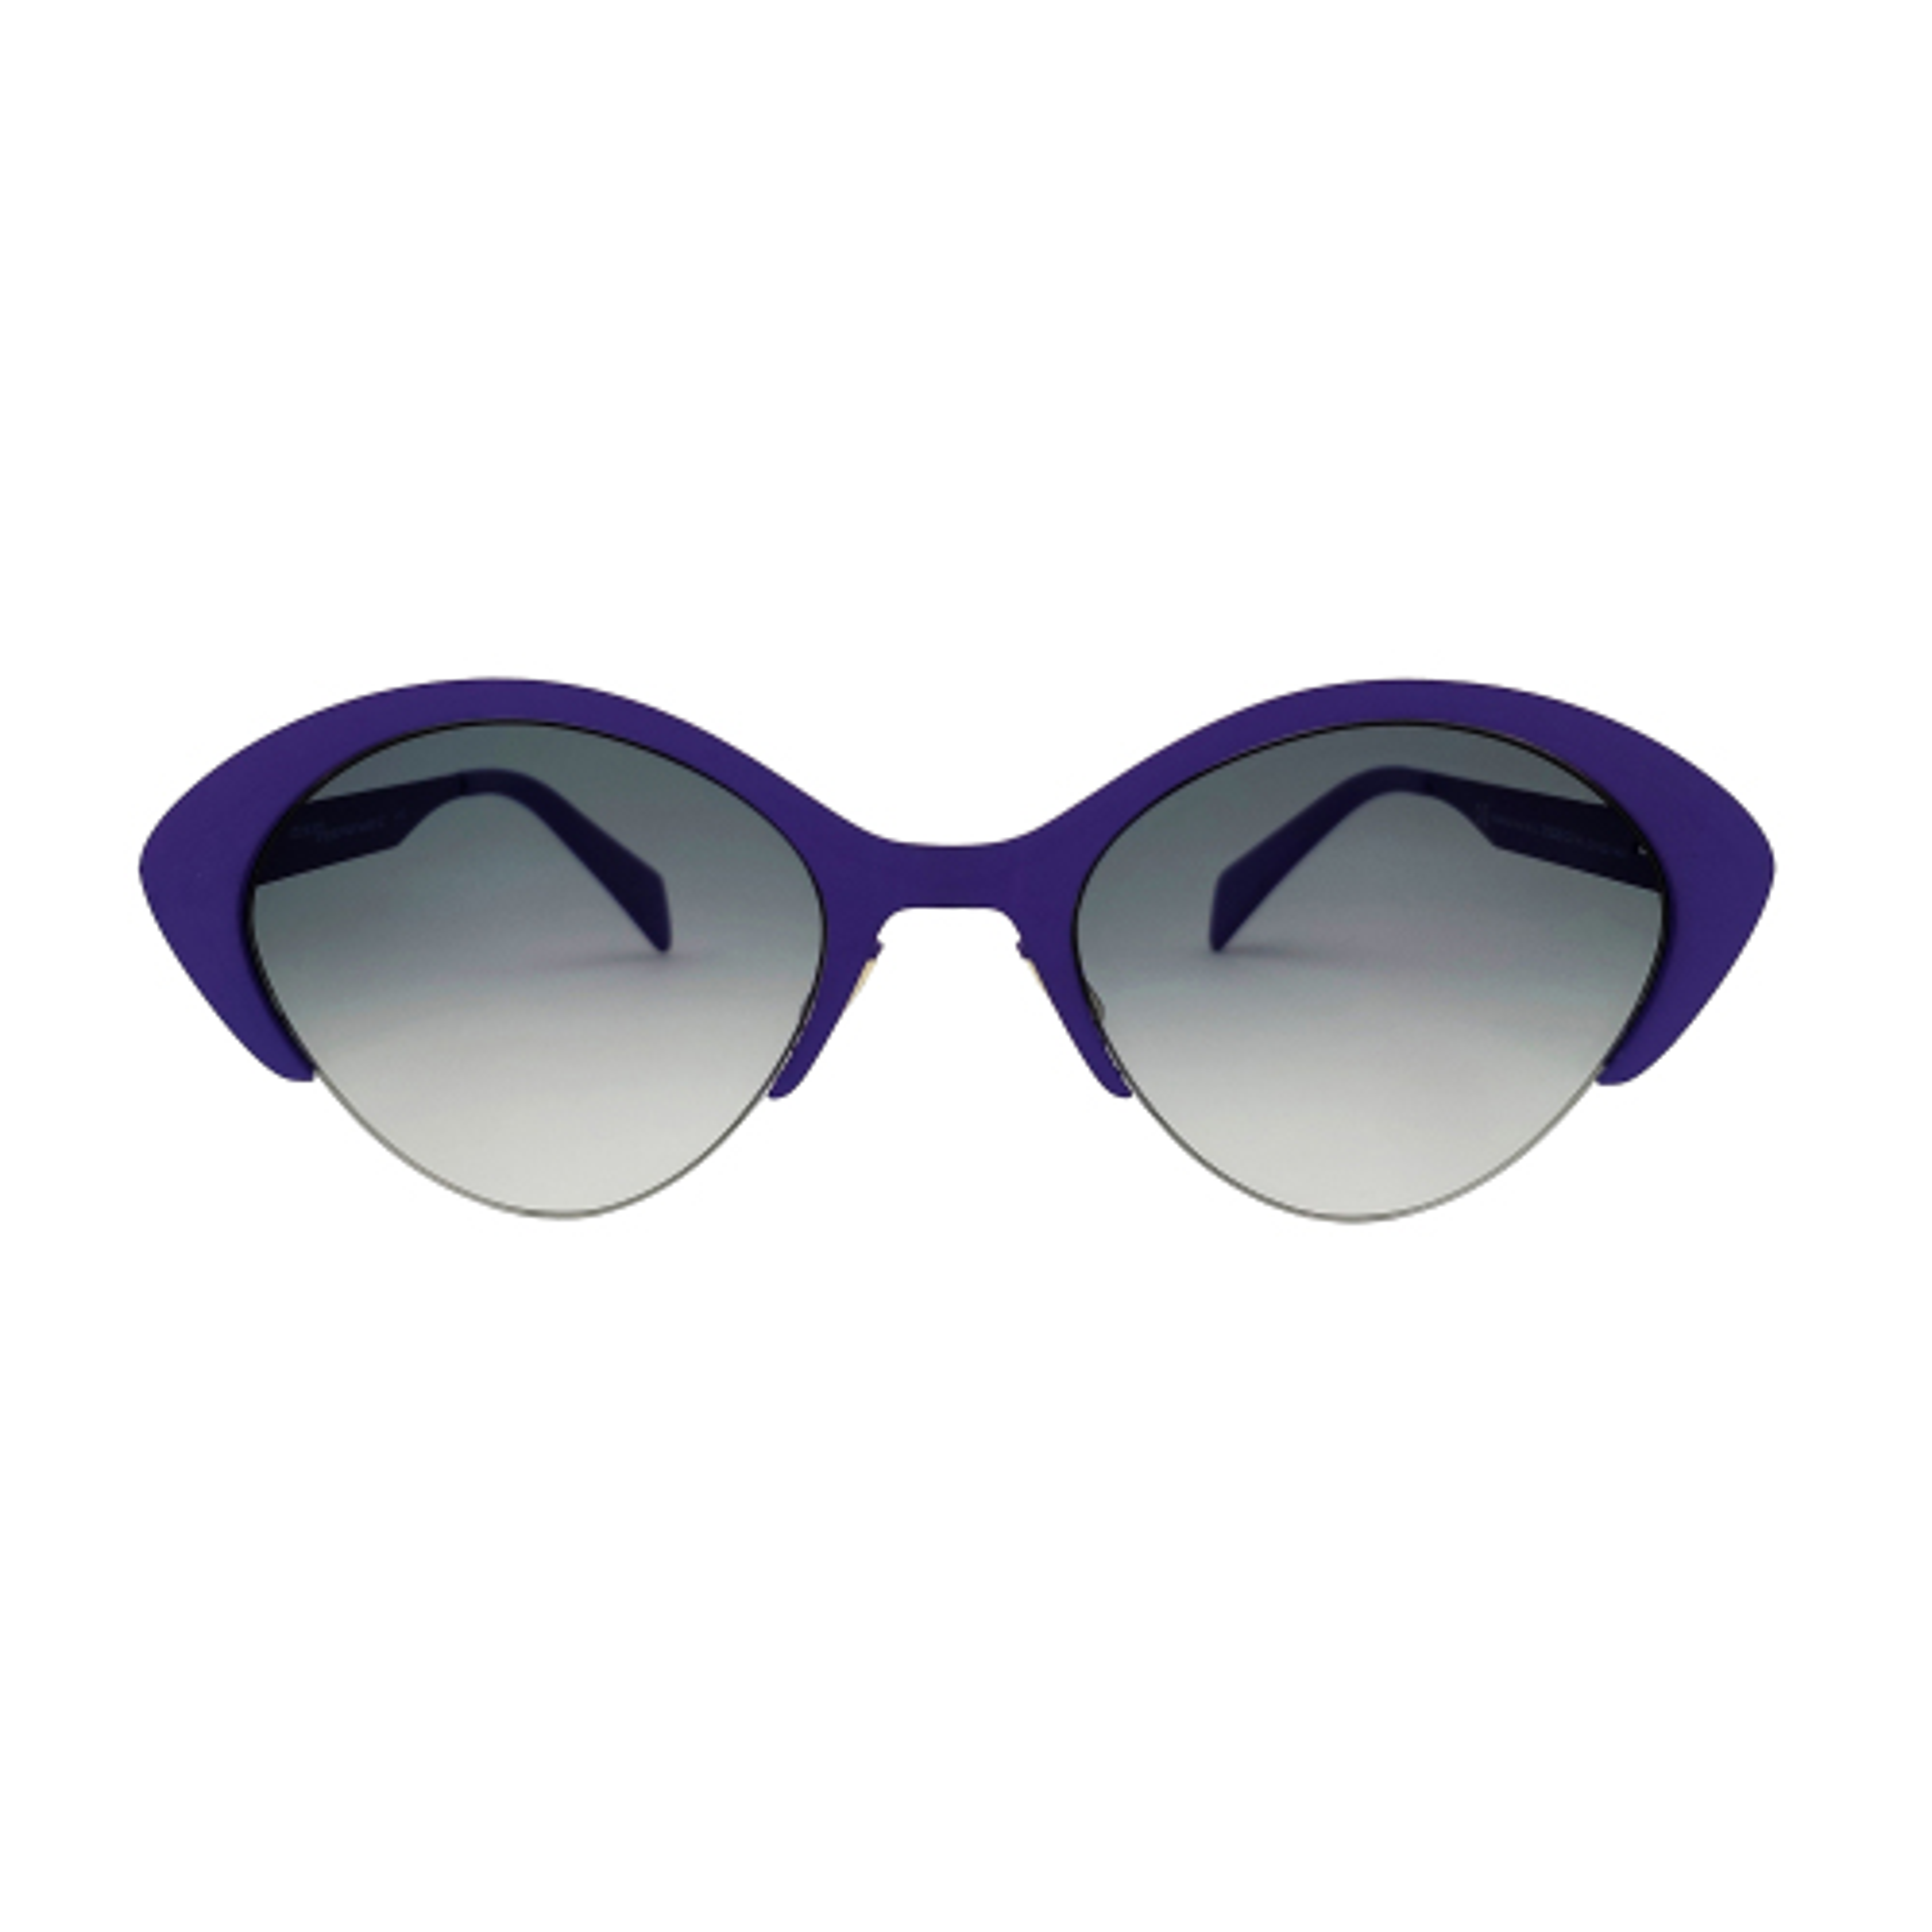 عینک آفتابی ایتالیا ایندپندنت کد 0505014